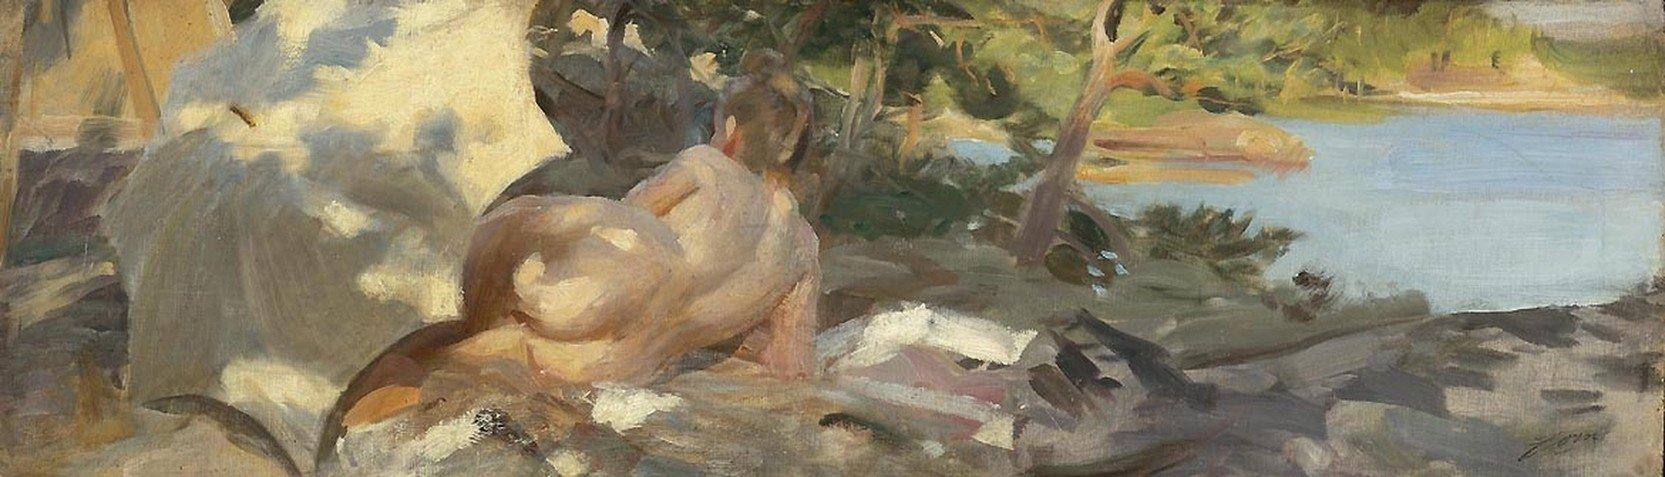 Artisti - Anders Zorn